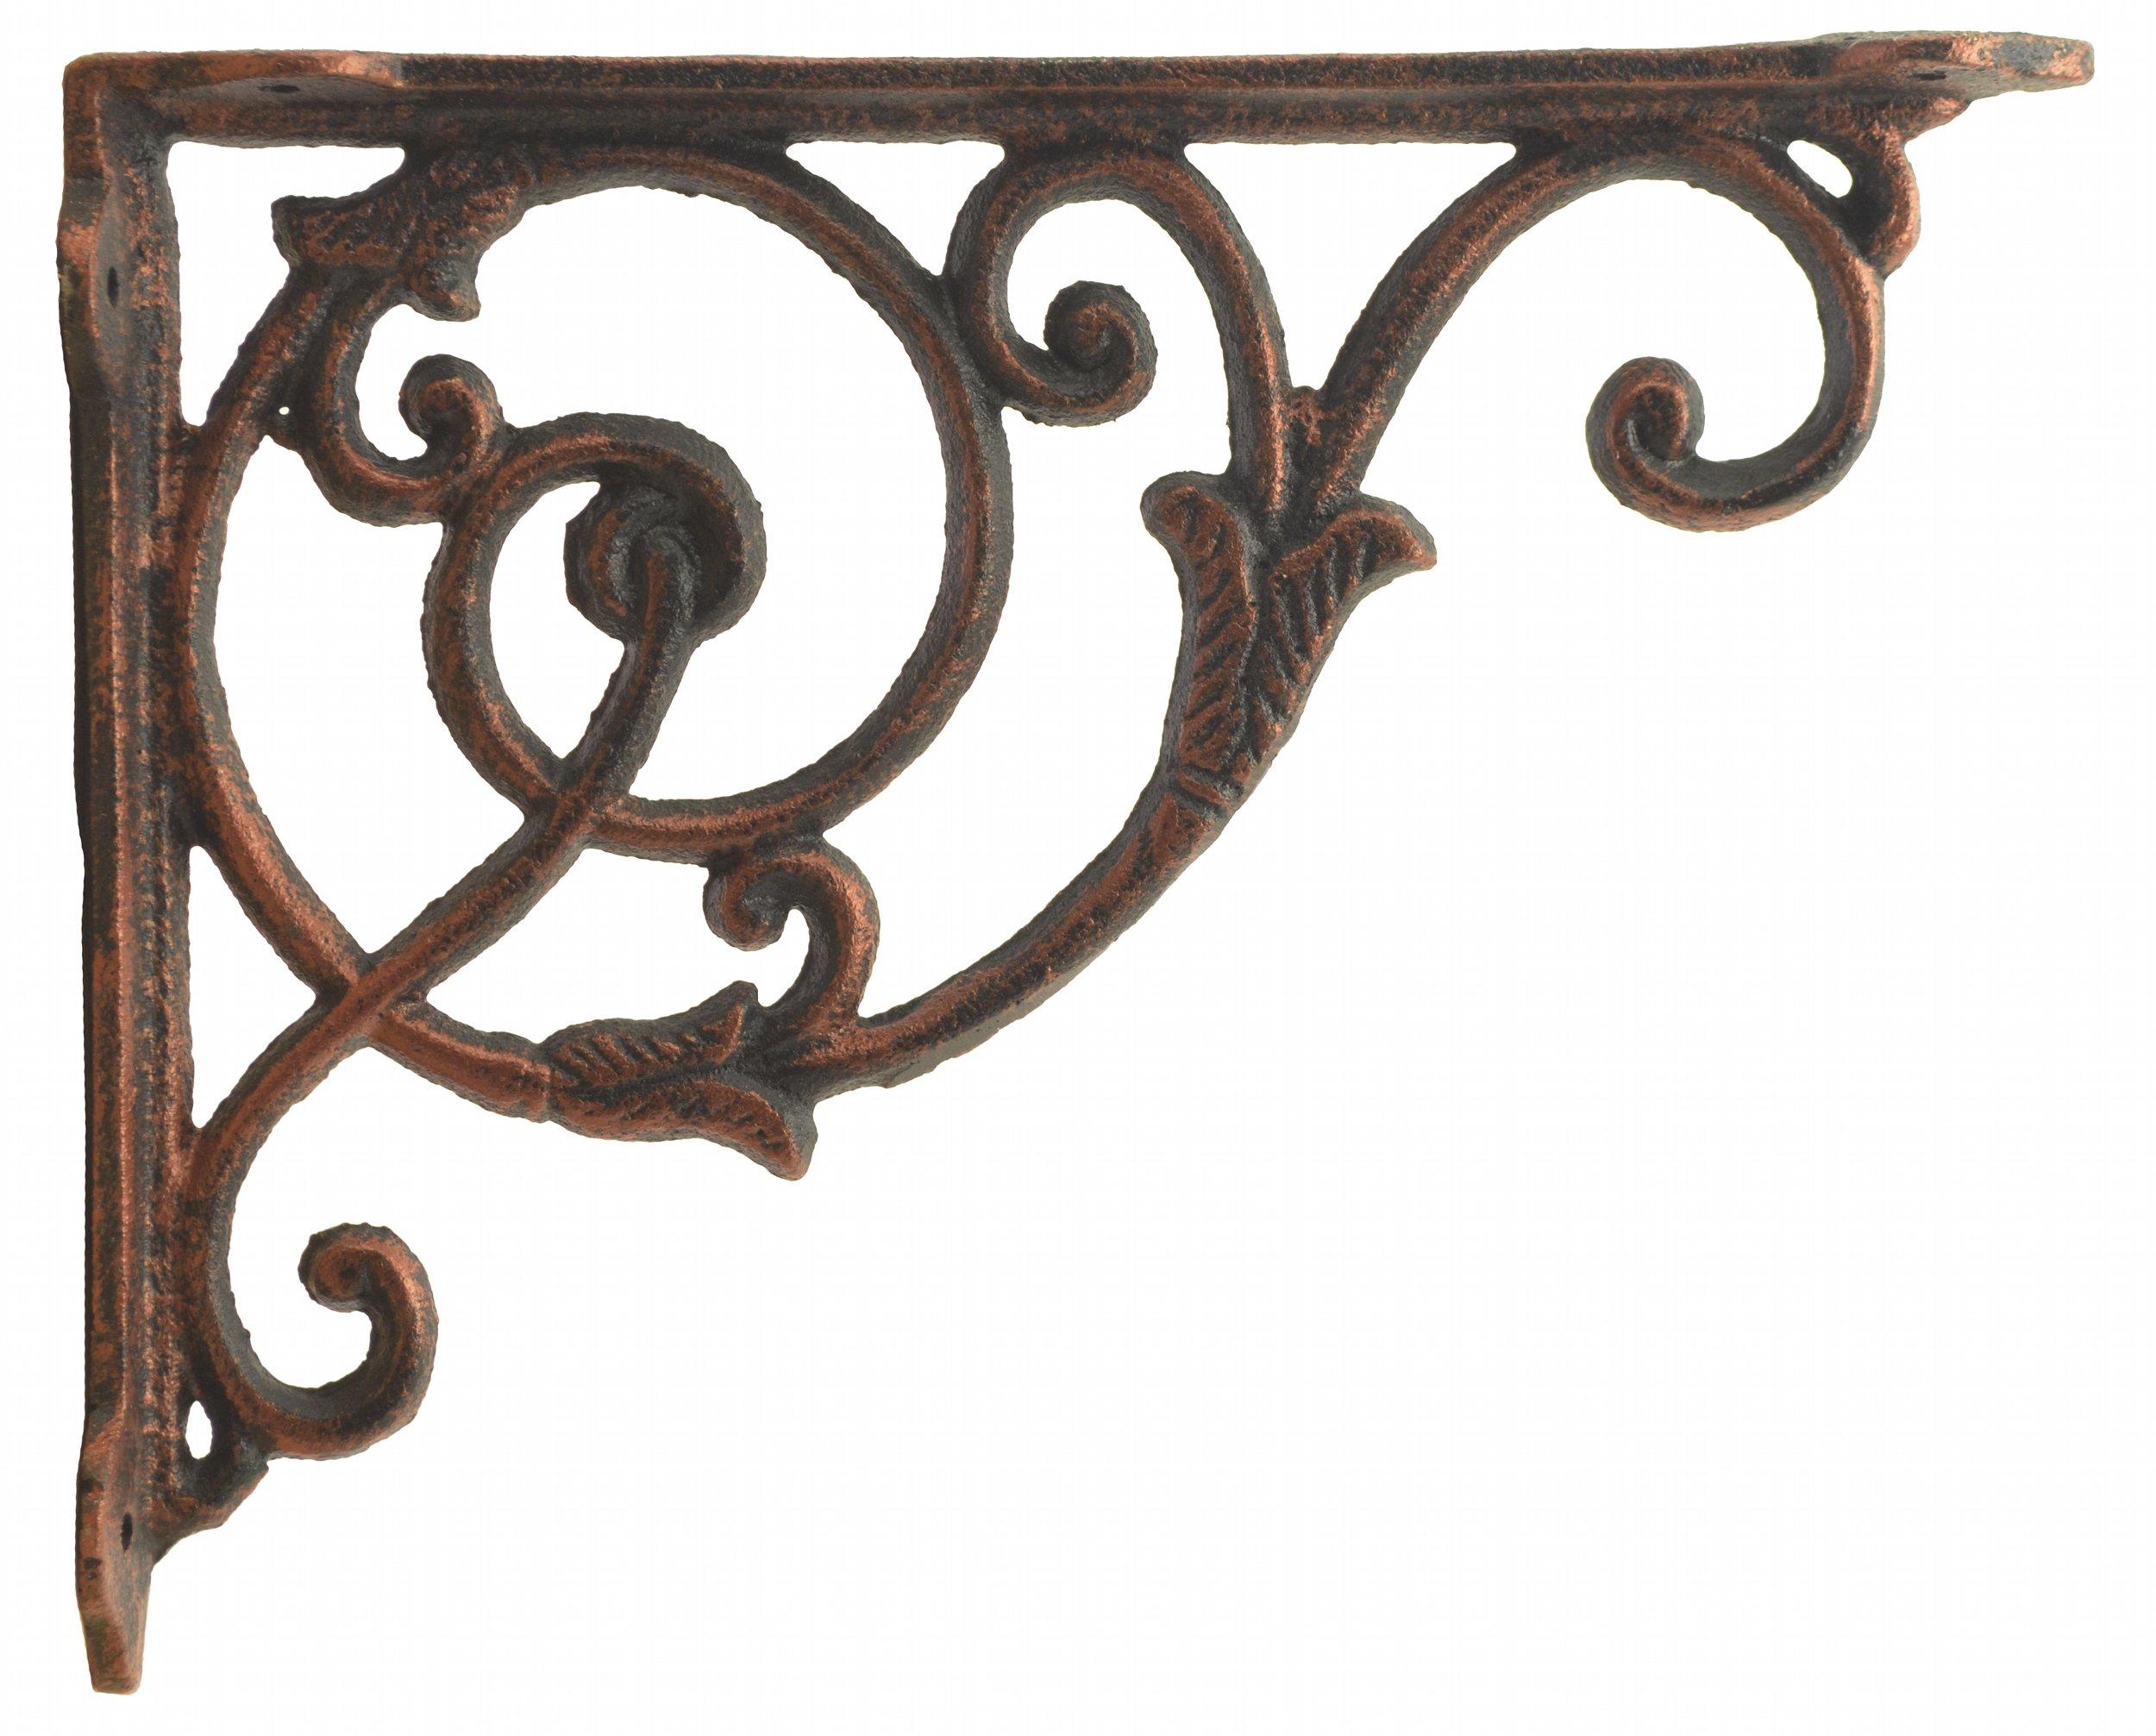 Decorative Cast Iron Wall Shelf Bracket Ornate Vine Bronze 8.5'' Deep